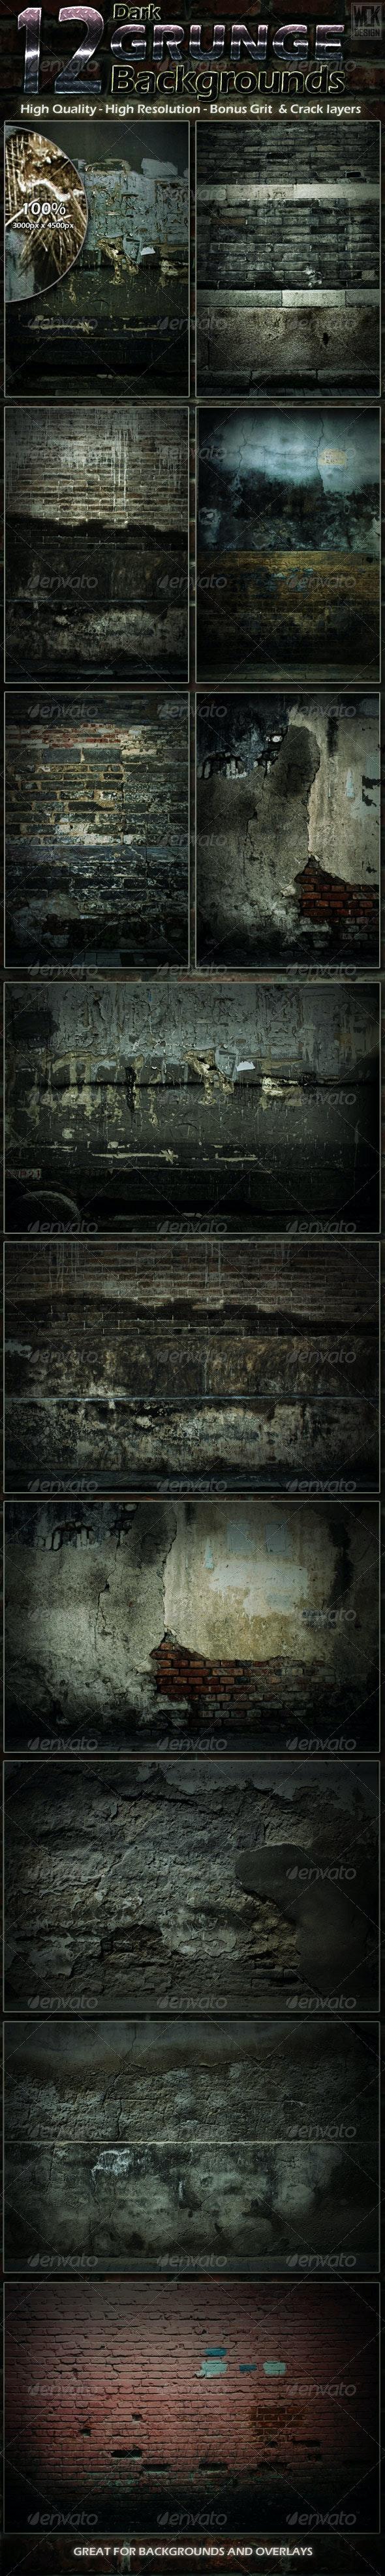 12 Dark Grunge Backgrounds - Backgrounds Graphics